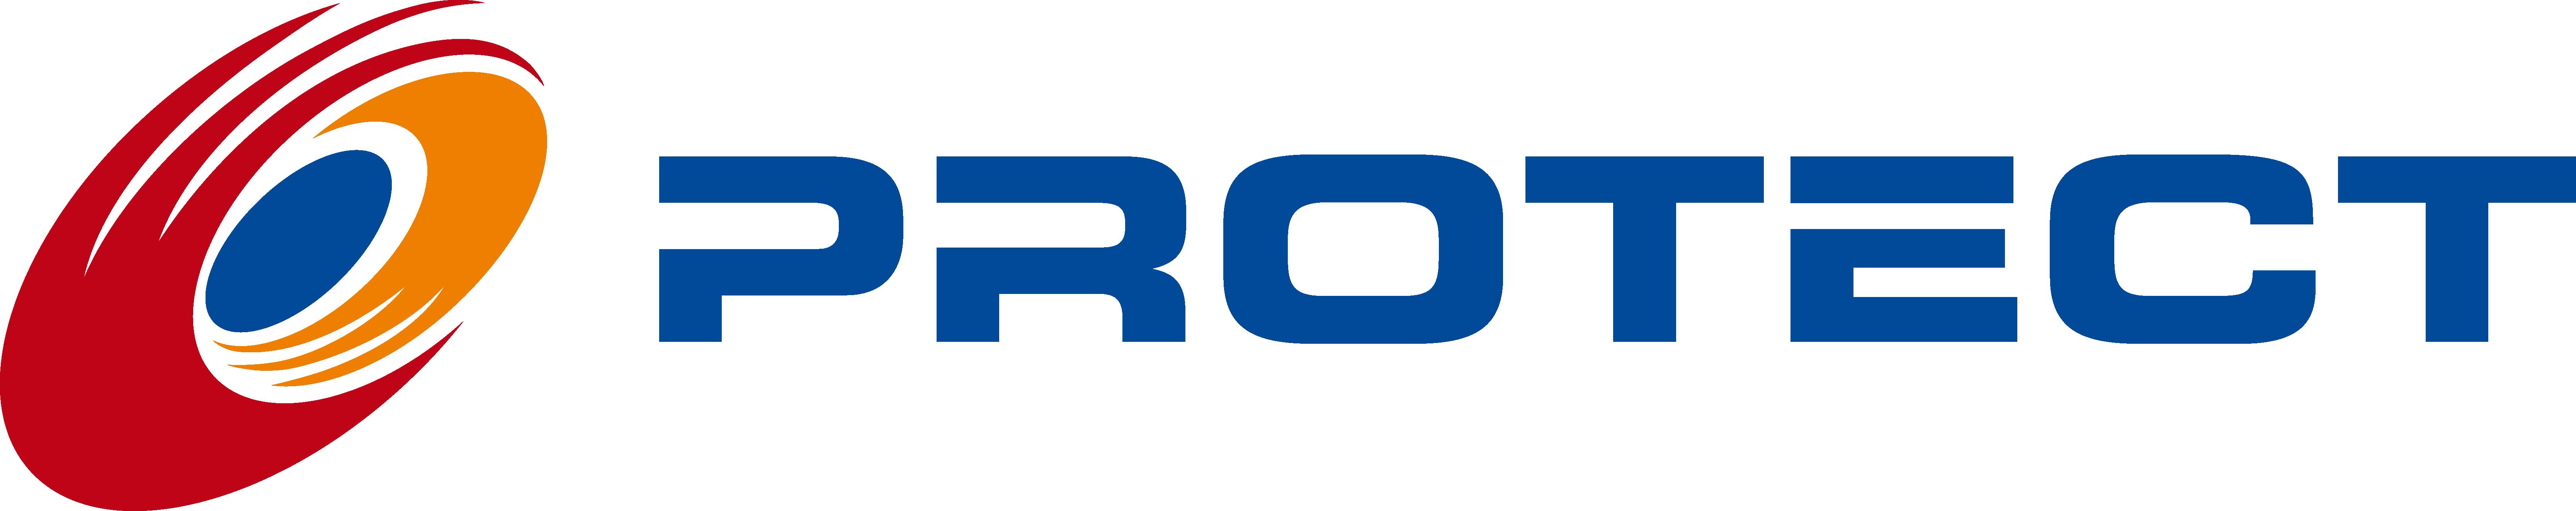 protect-logo.png (116 KB)